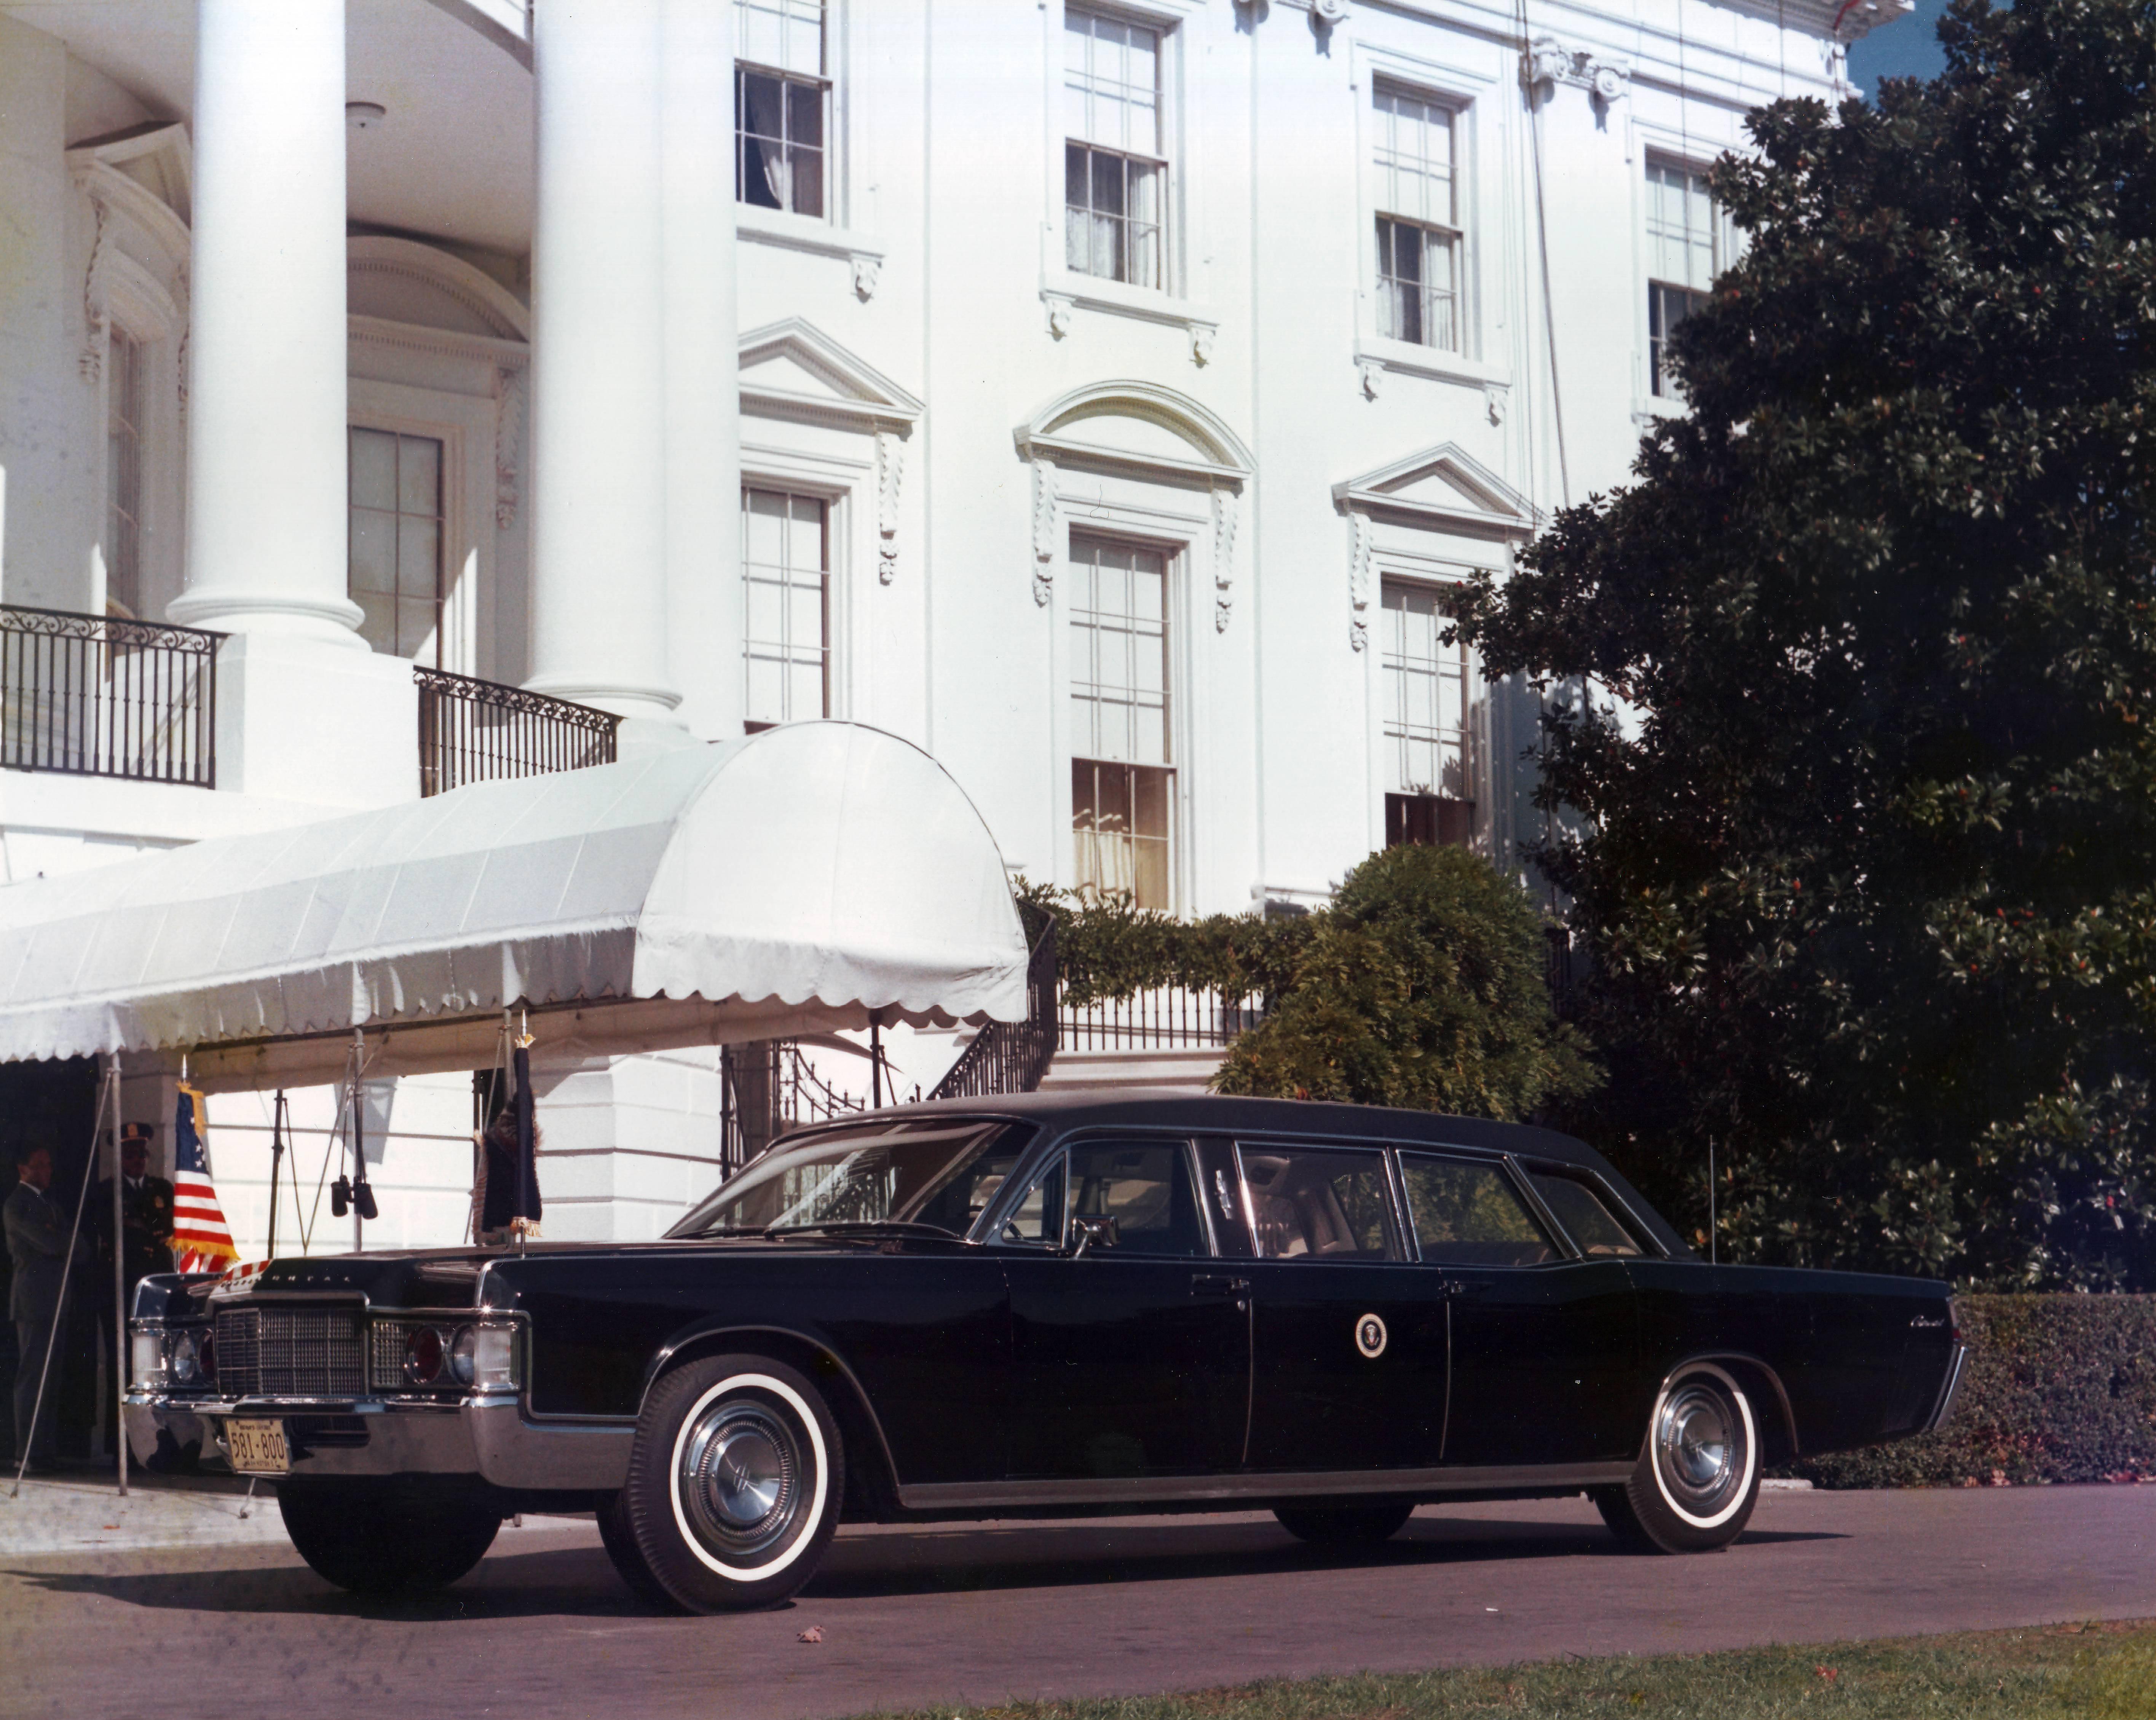 File:1969 Presidential Limousine, Washington DC.JPG ...